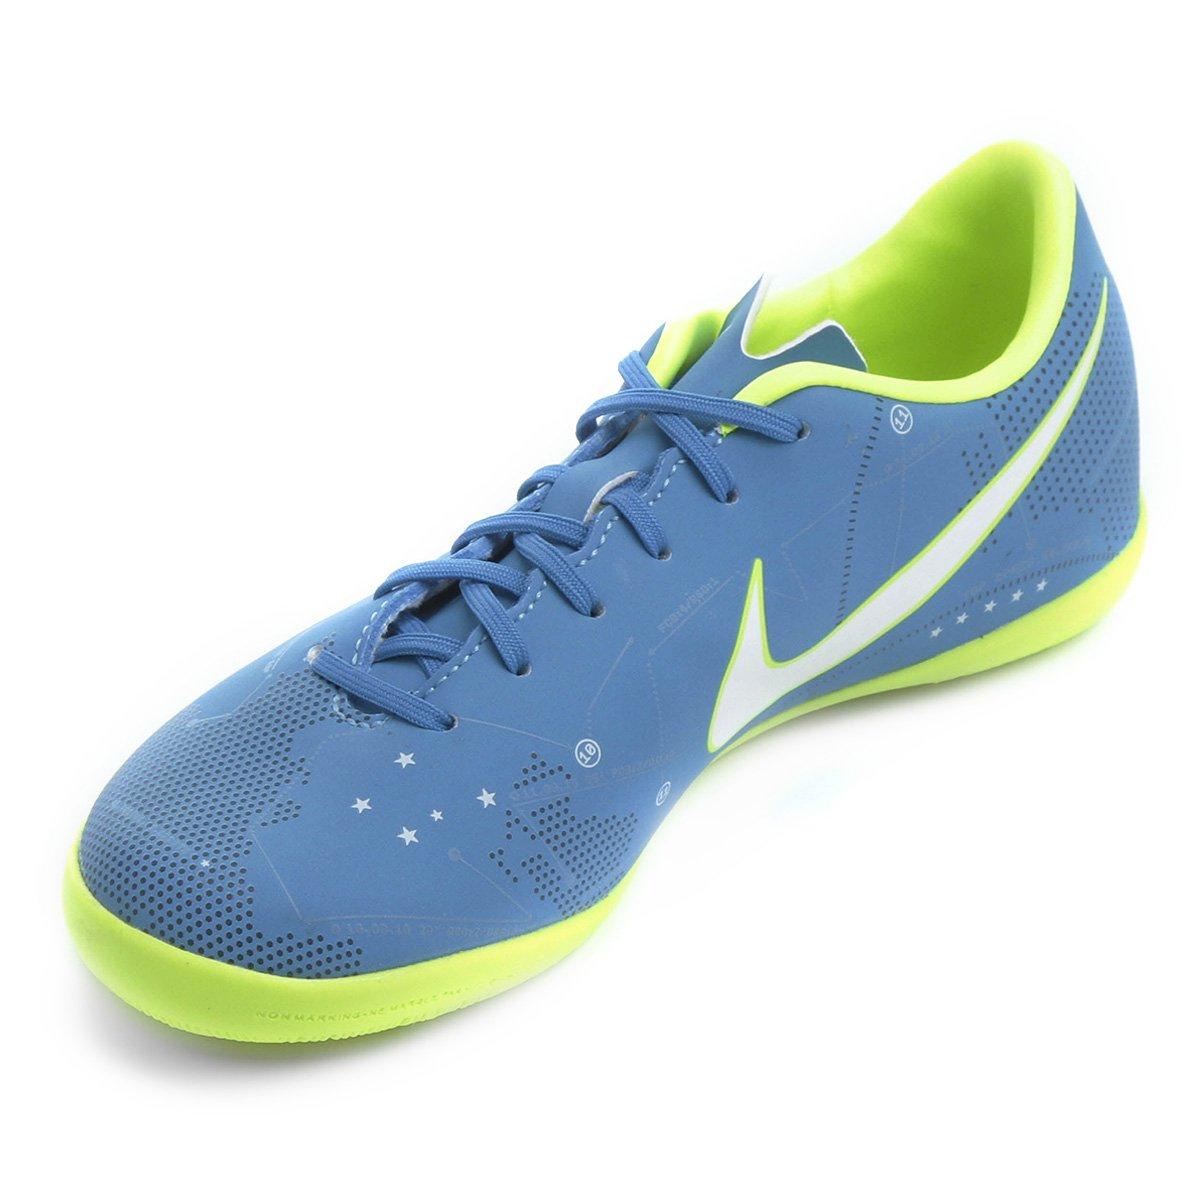 Chuteira Futsal Infantil Nike Mercurial Victory 6 Neymar Jr IC ... 6f813500f9851